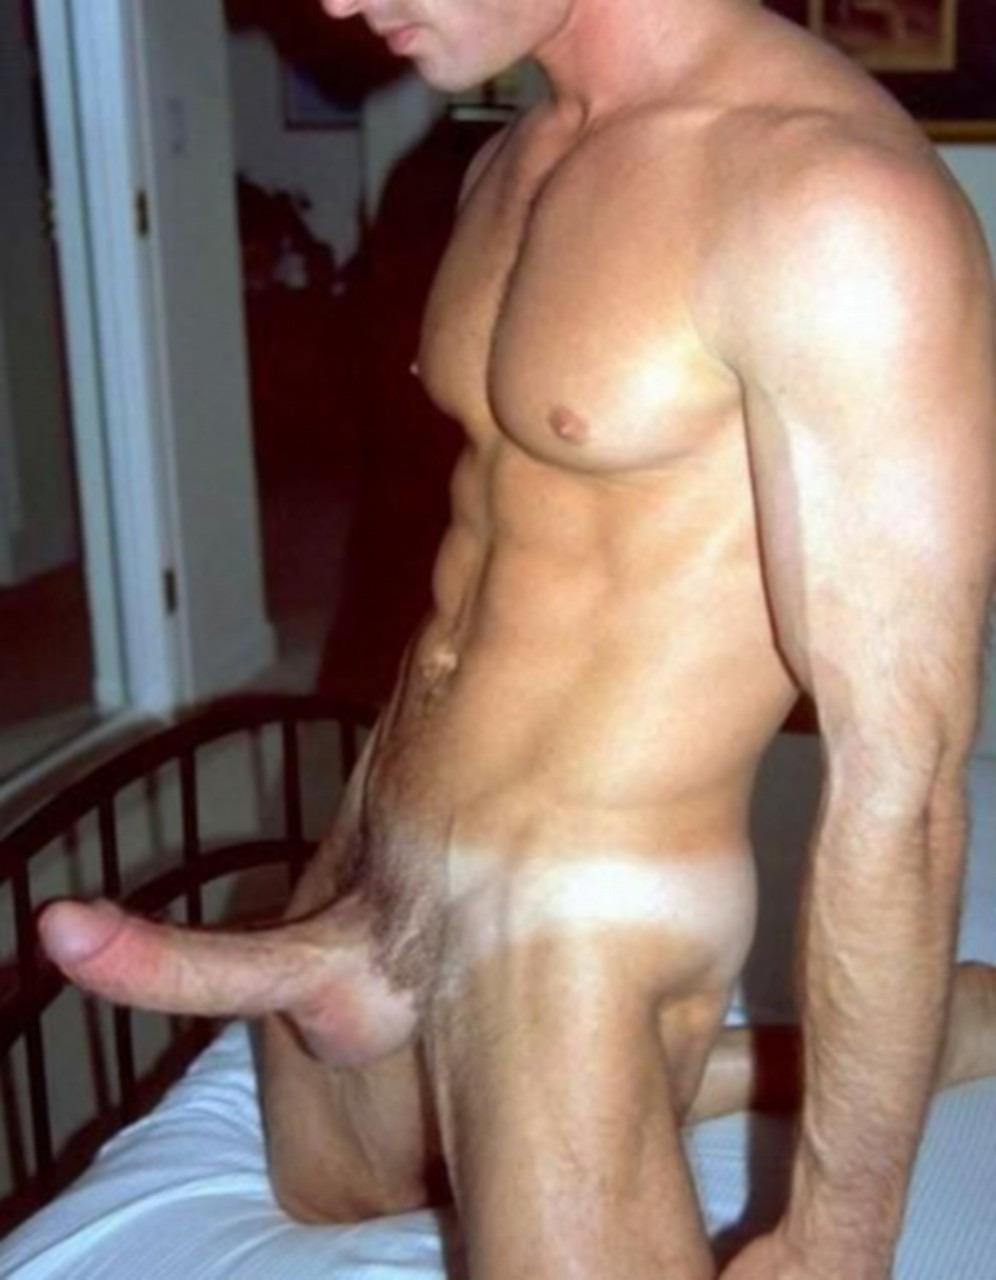 gay hot daddy dude men porn boner